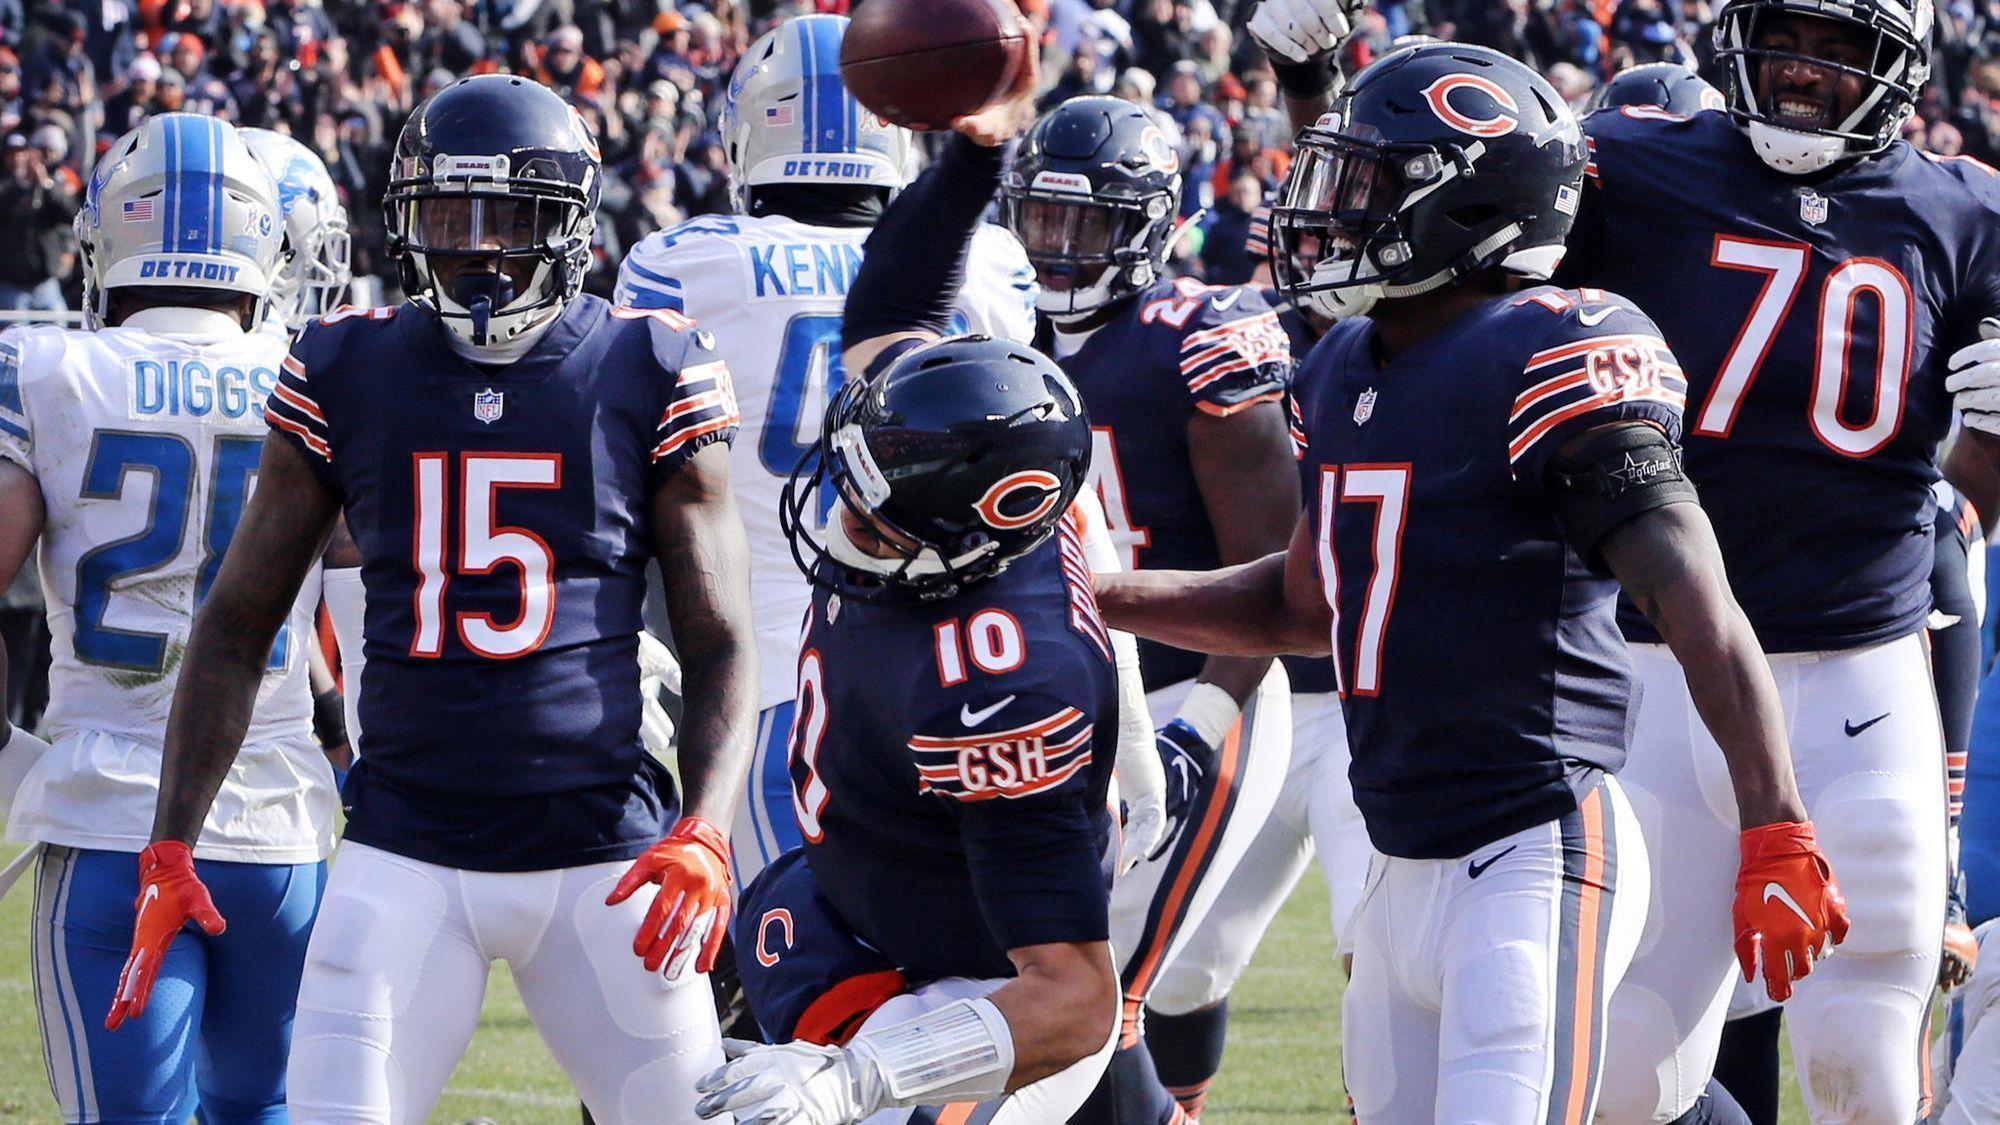 Ct-spt-bears-lions-playoffs-trubisky-nagy-rosenbloom-20181111